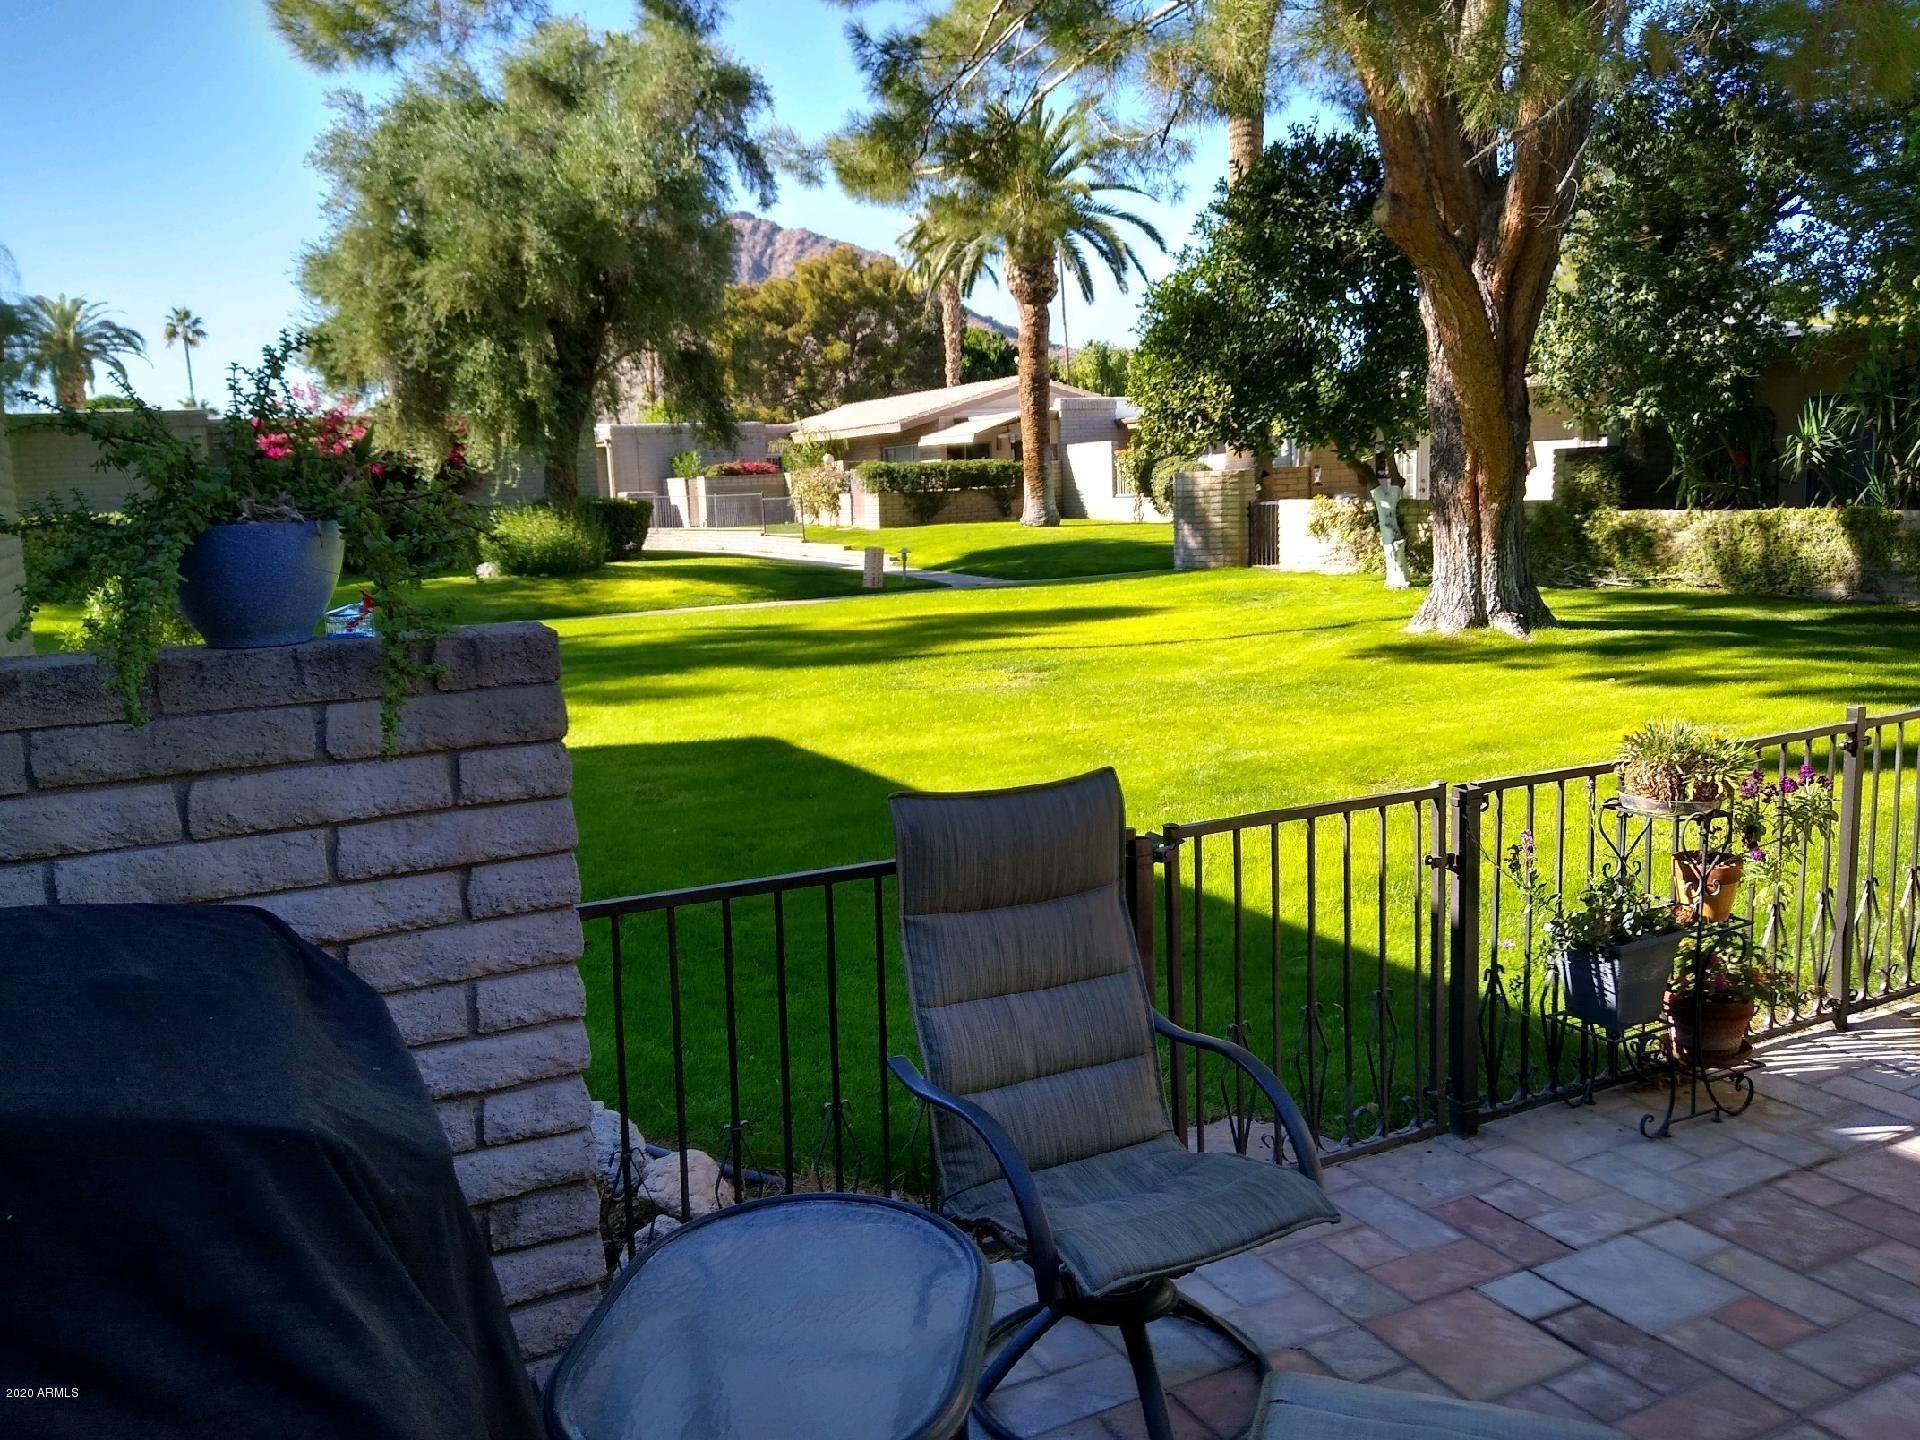 Photo for 4800 N 68TH Street #258, Scottsdale, AZ 85251 (MLS # 6180657)